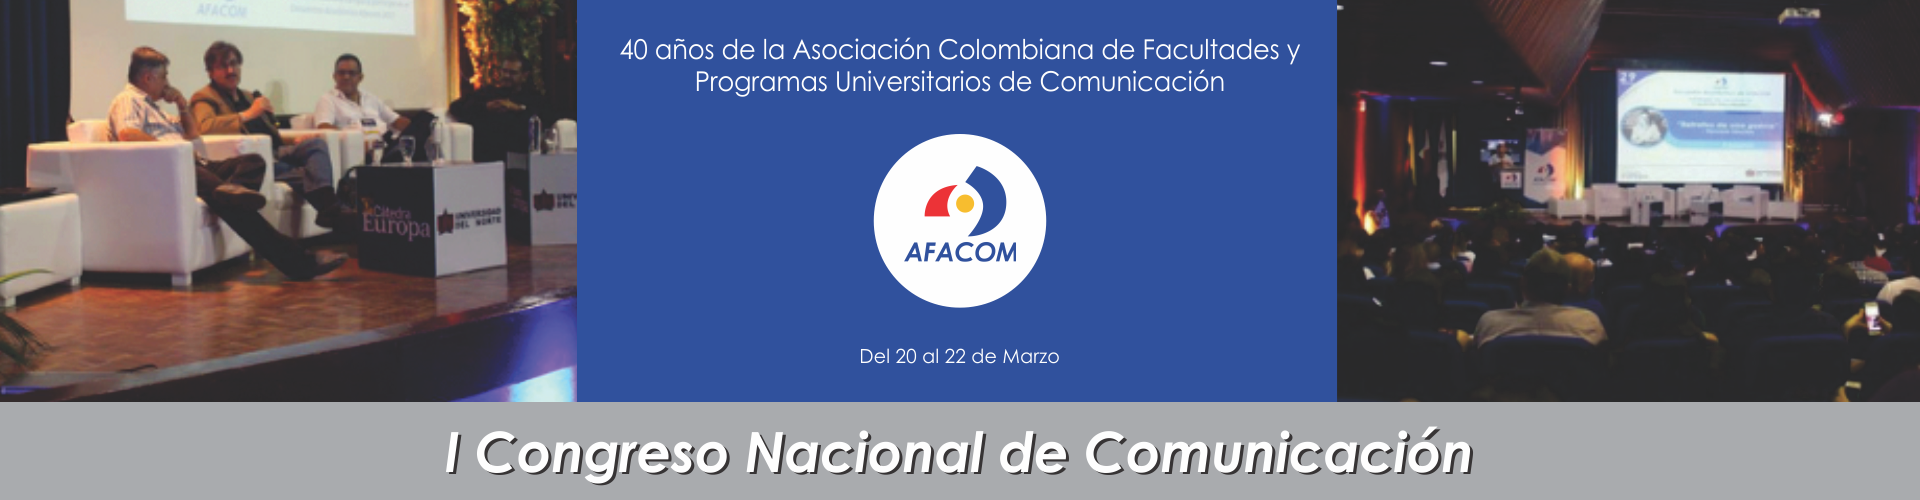 Congreso-Afacom-PW1